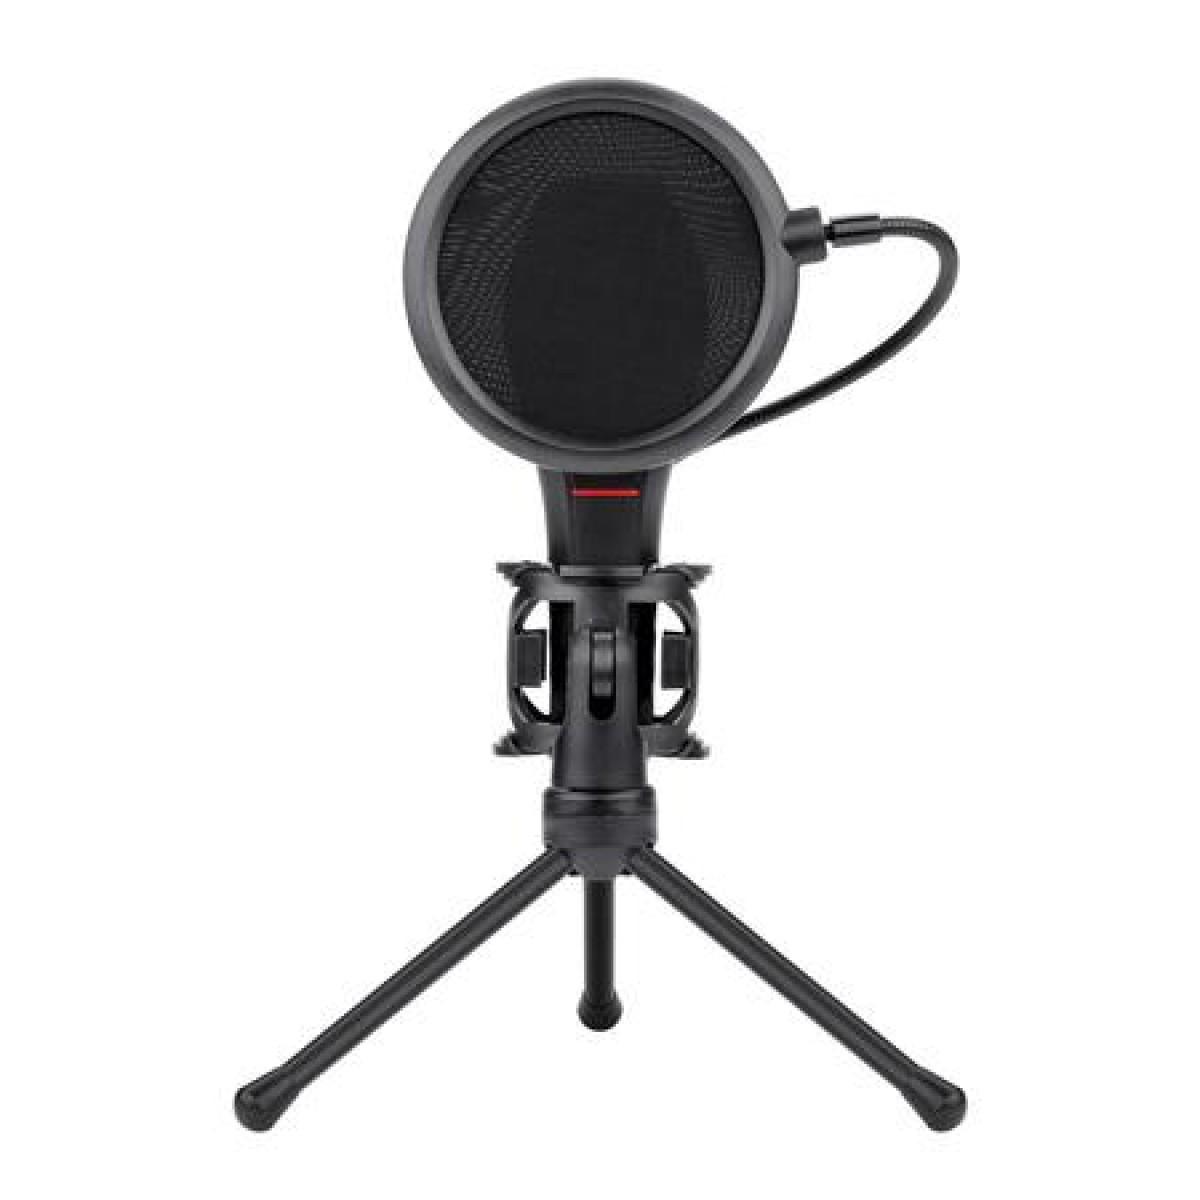 Microfone Gamer Quasar 2 GM200 Redragon